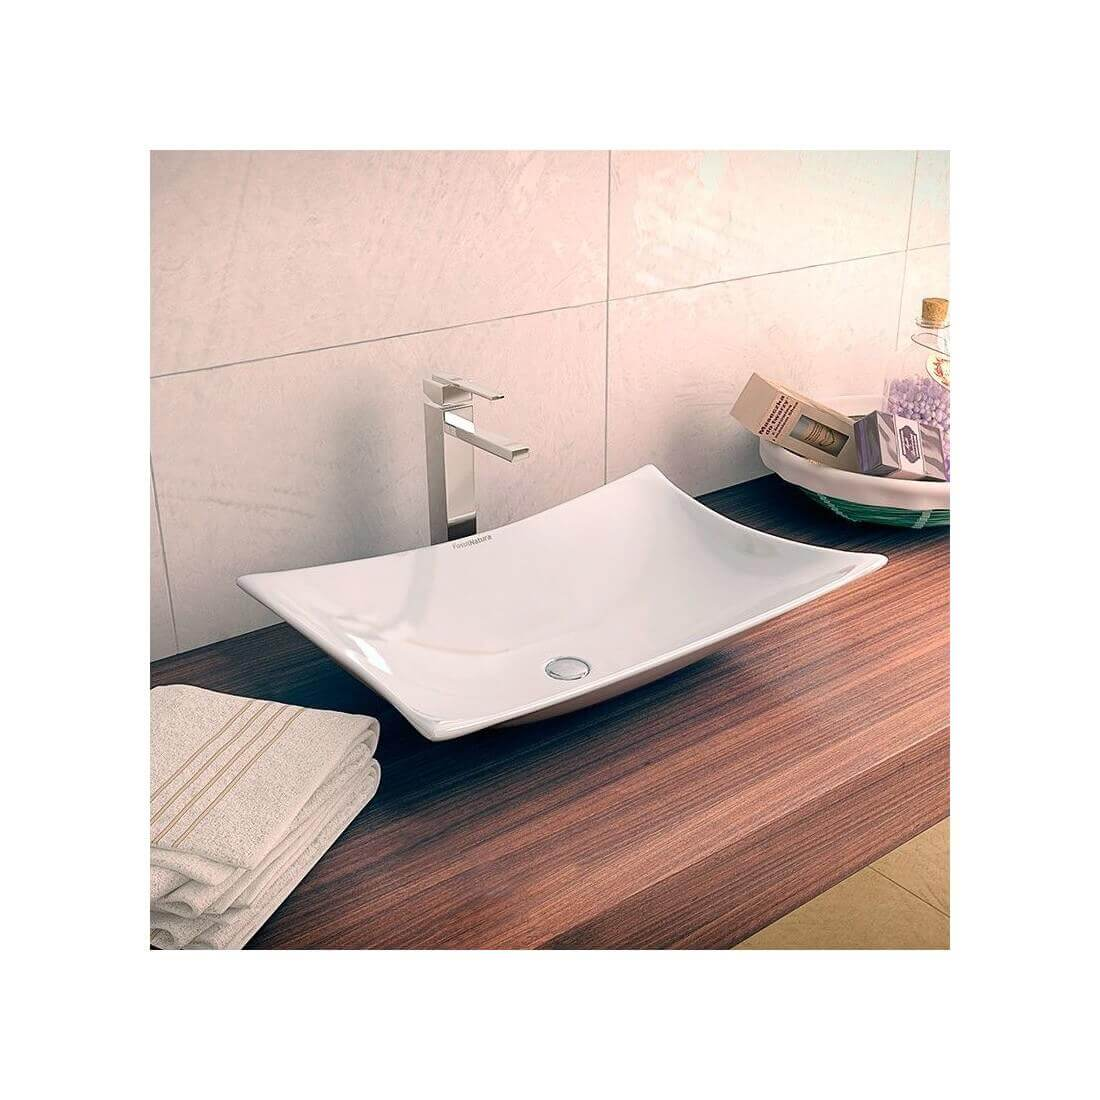 Encimeras de lavabo fabulous lavabo sobre encimera - Lavabo sobre encimera ...